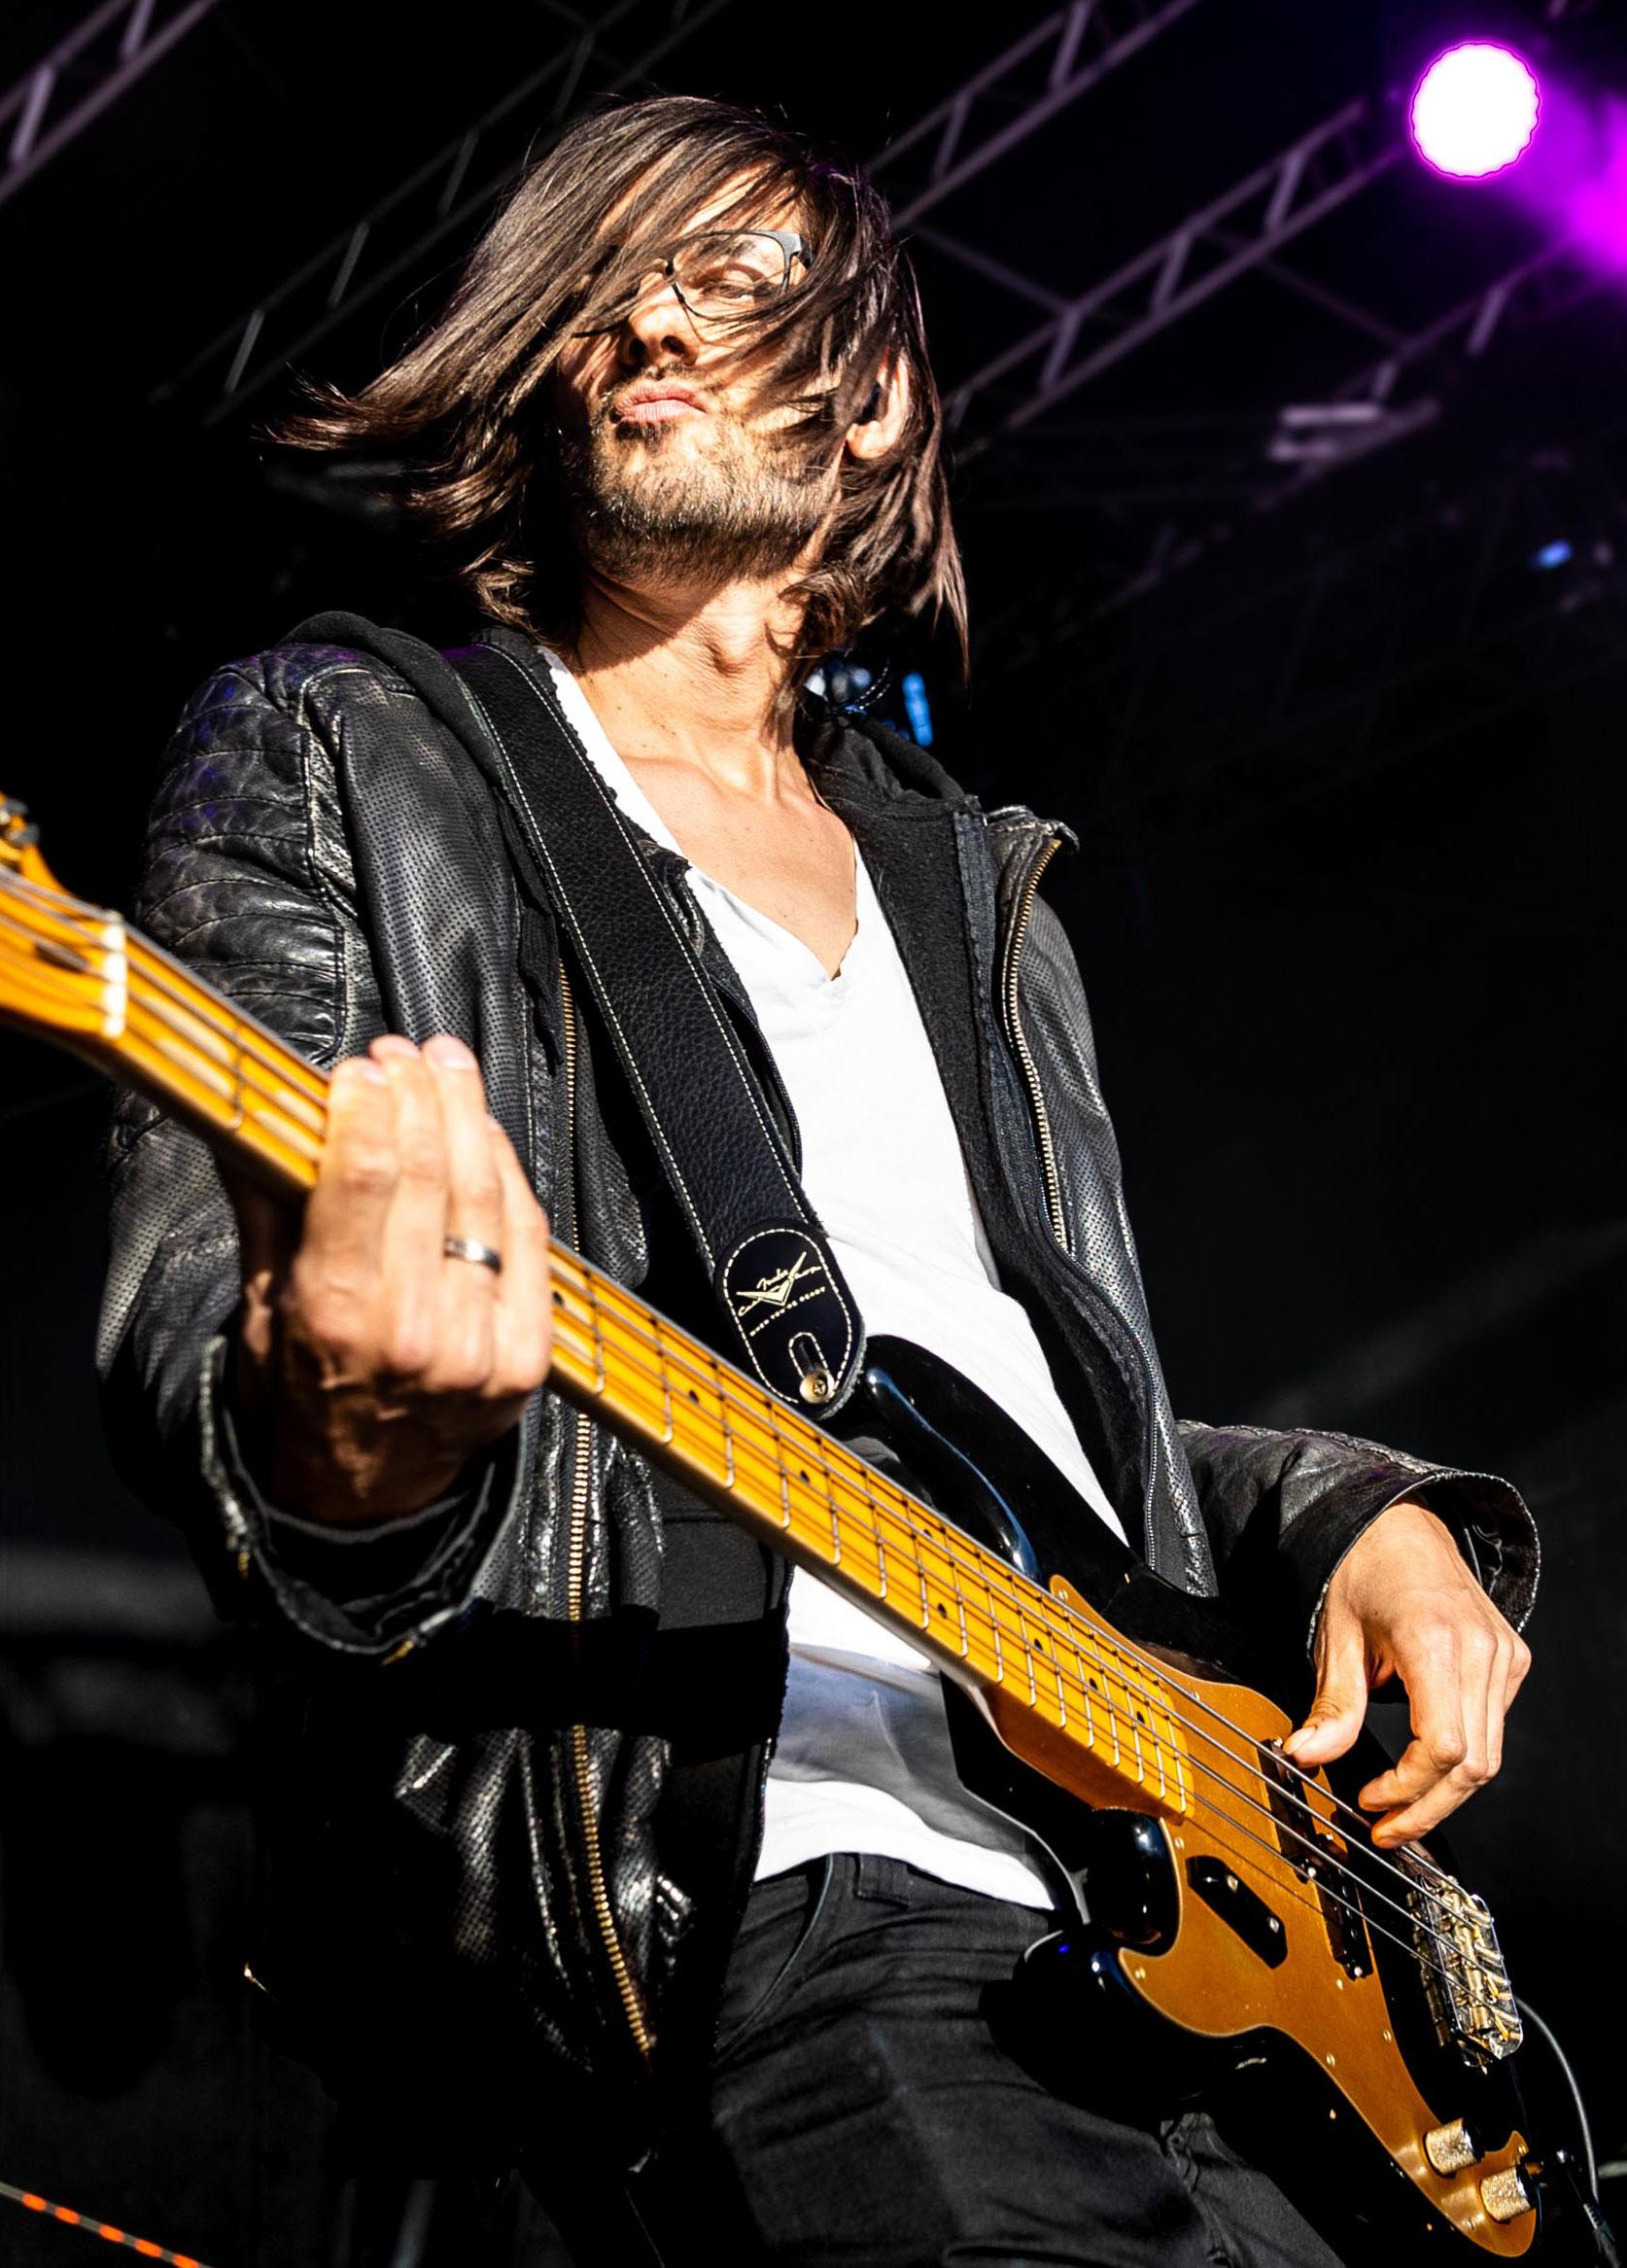 FRESH-MUSIC-LIVE_MUSICIAN_ALEX-HEILMANN_07